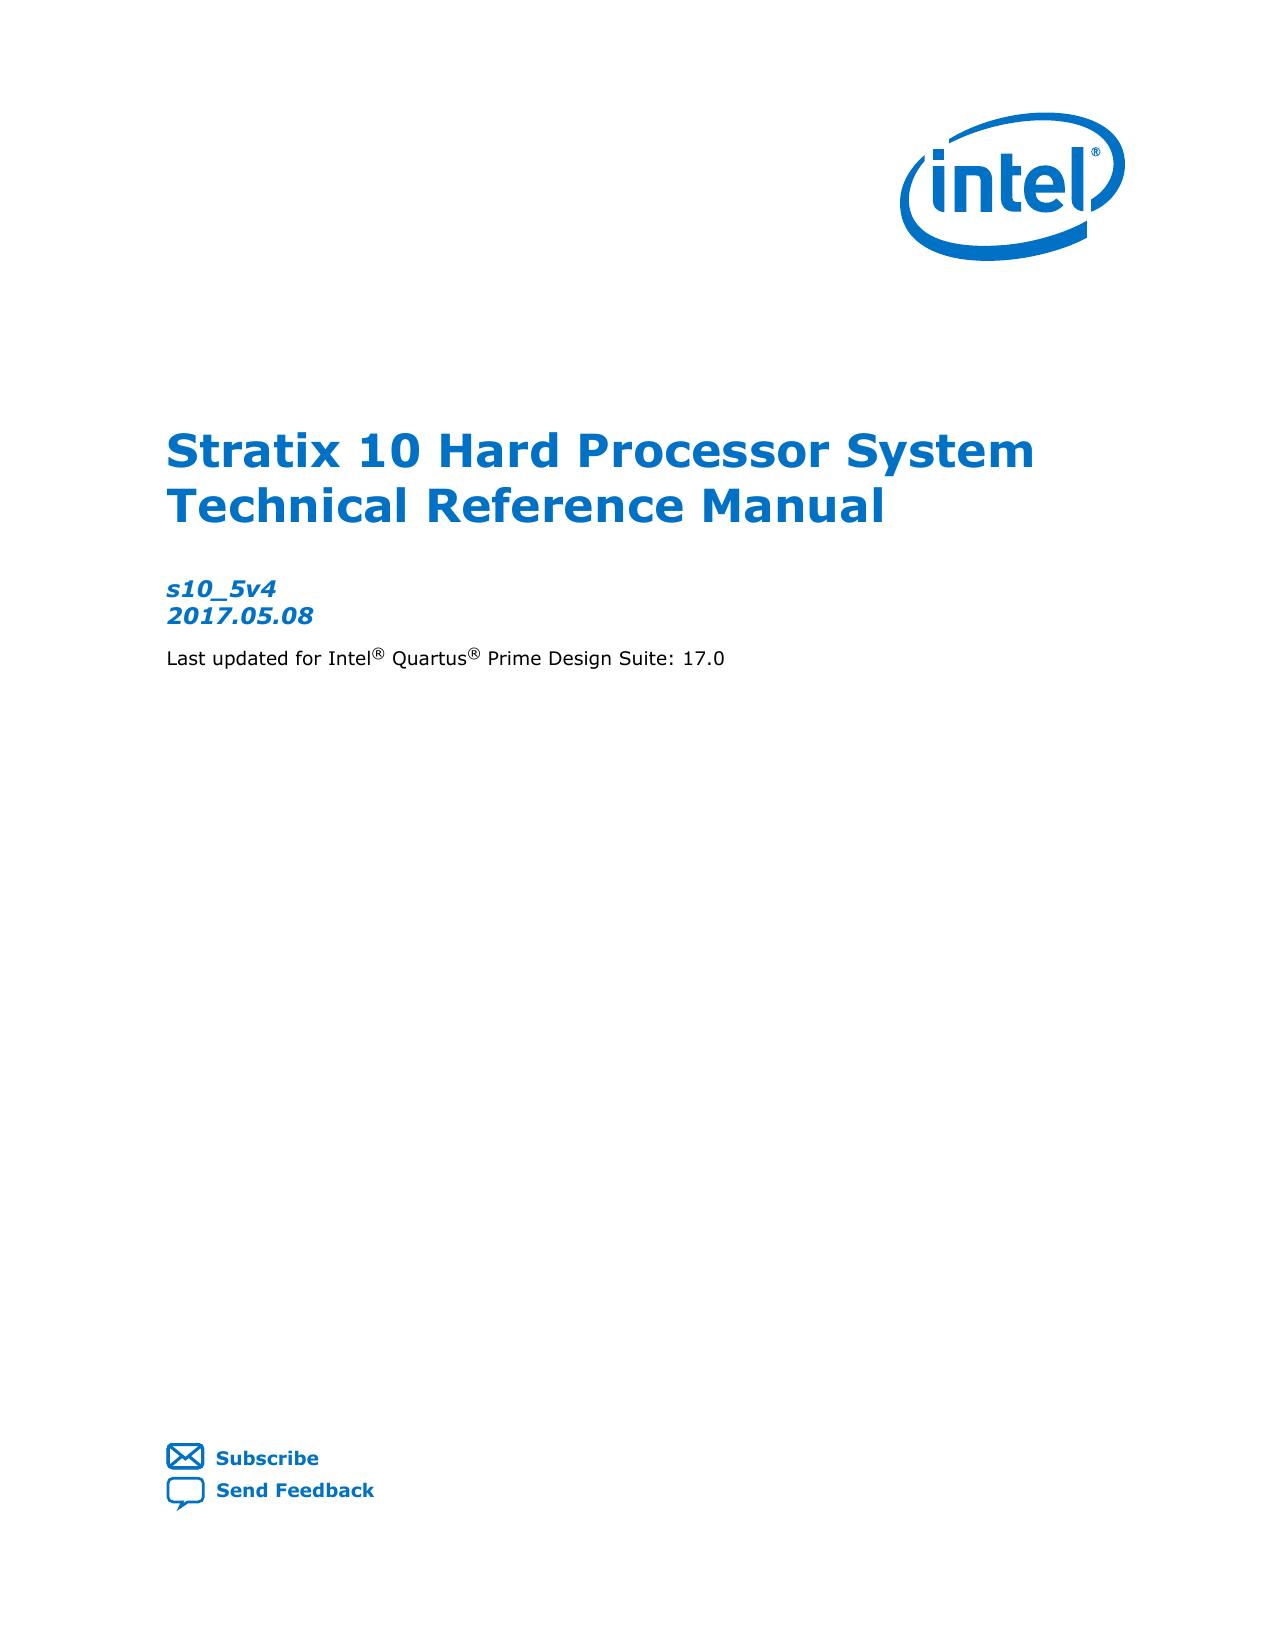 Stratix 10 Hard Processor System Technical Reference   manualzz com